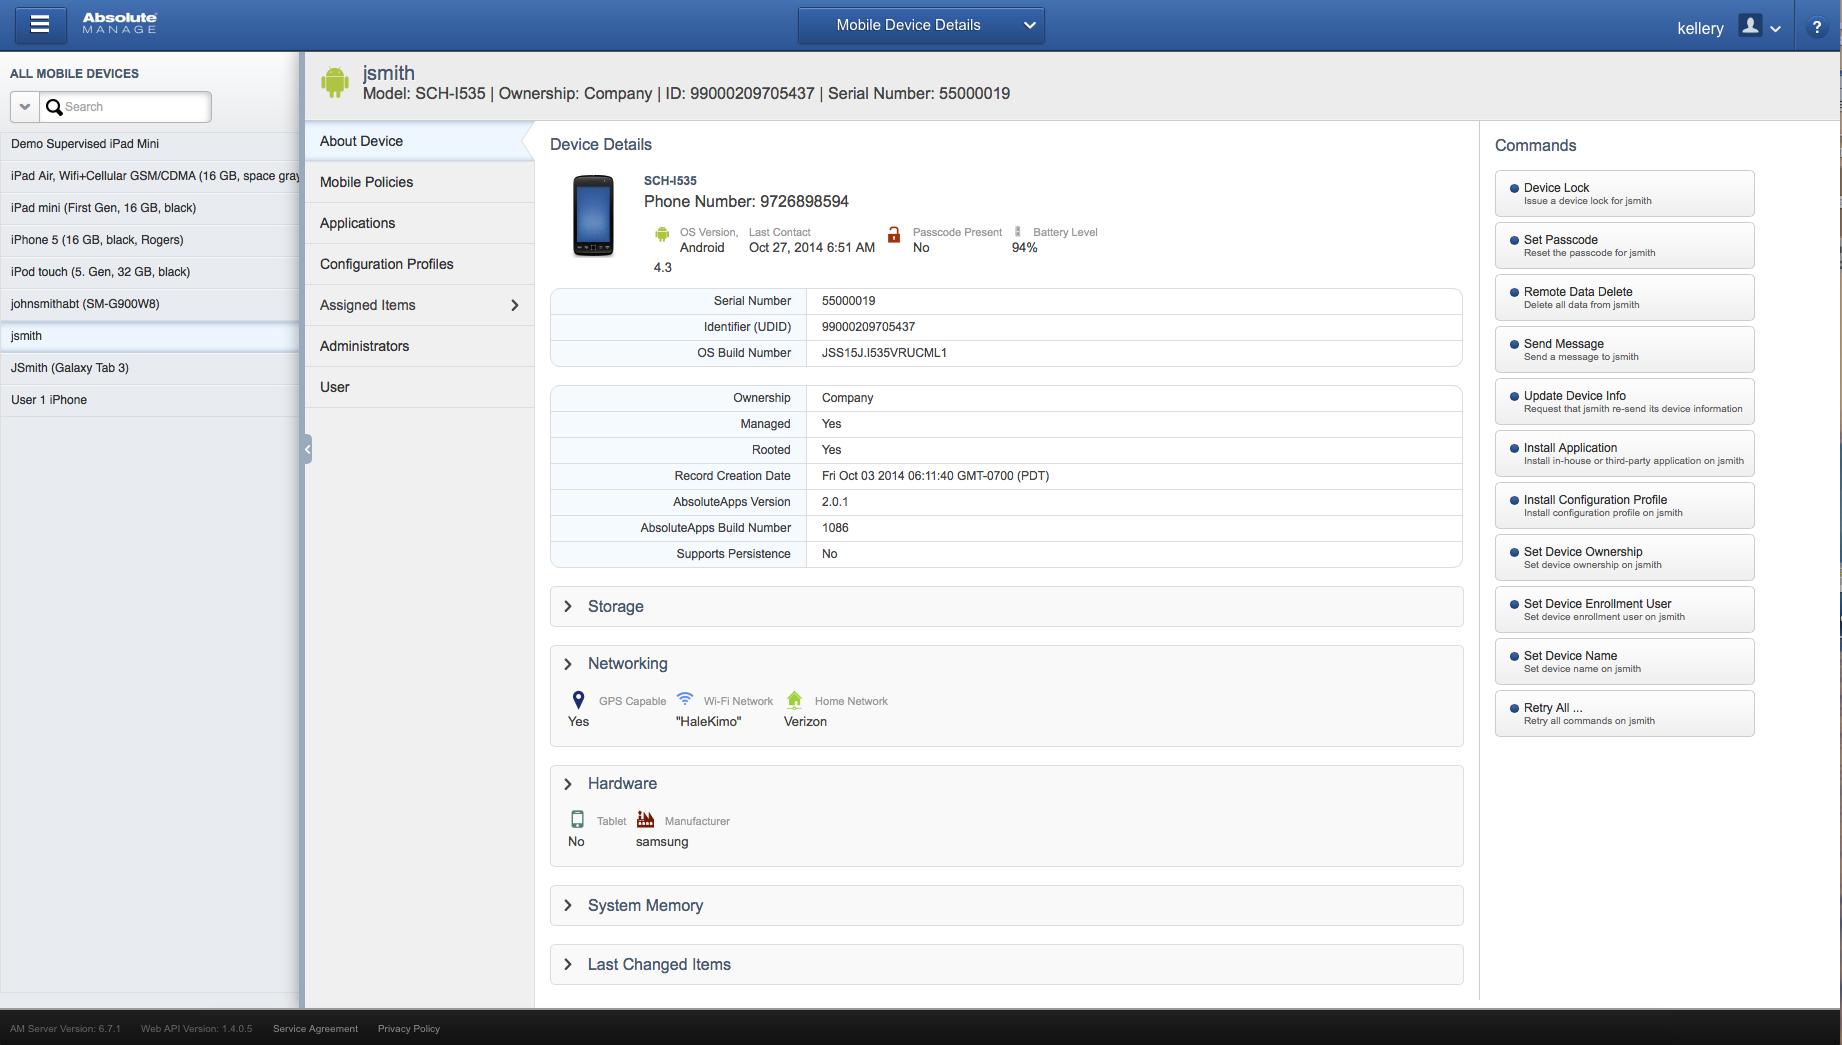 HEAT LANrev Client Management Demo - Absolute Manage Web UI